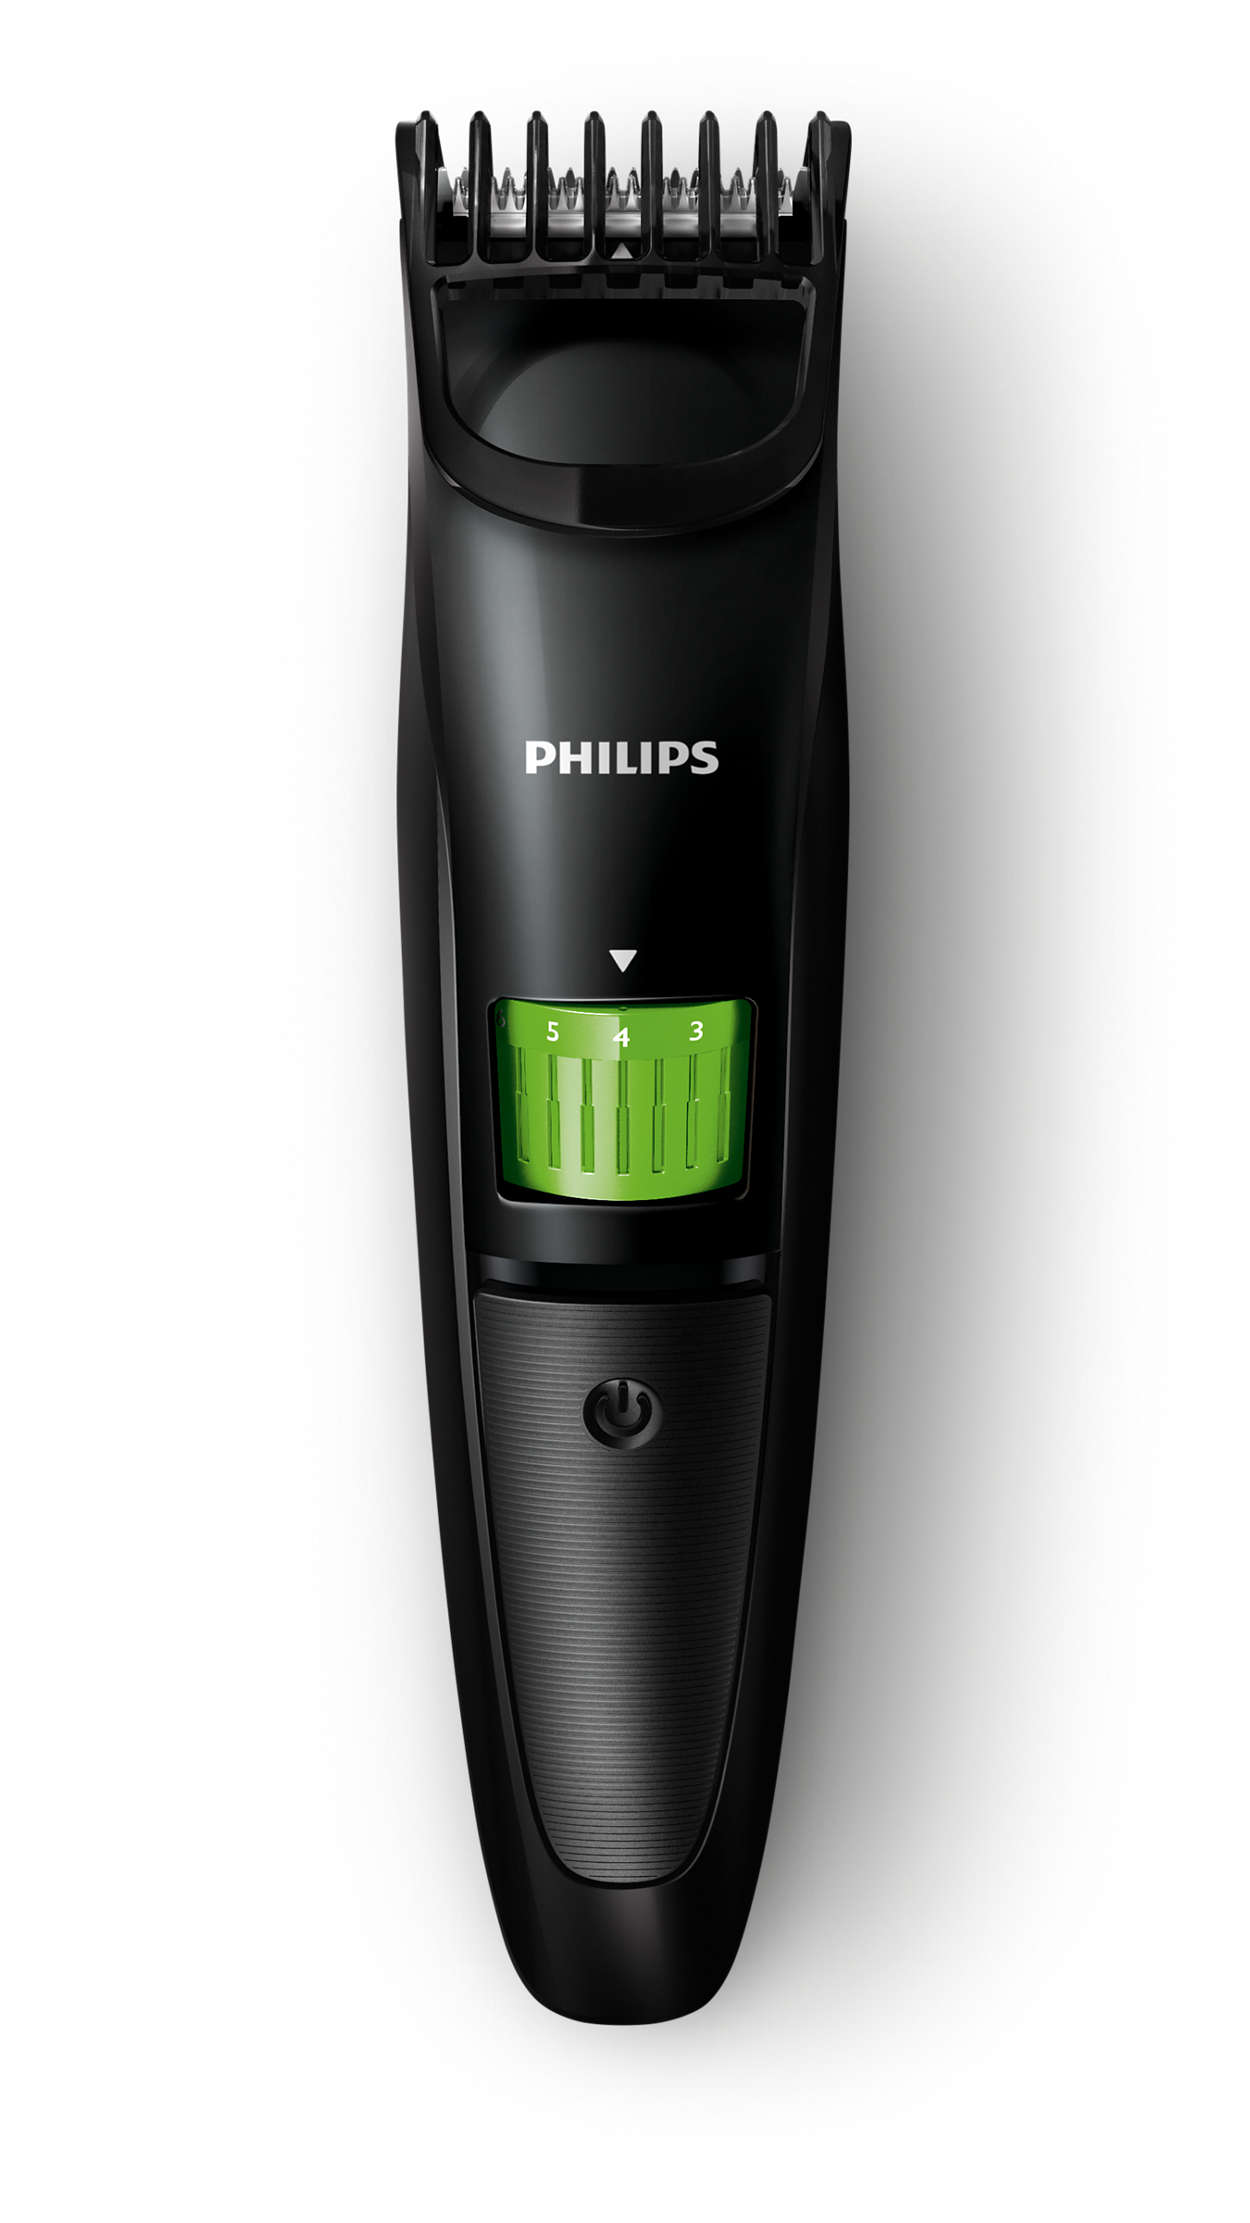 beardtrimmer series 3000 beard trimmer qt3310 15 philips. Black Bedroom Furniture Sets. Home Design Ideas